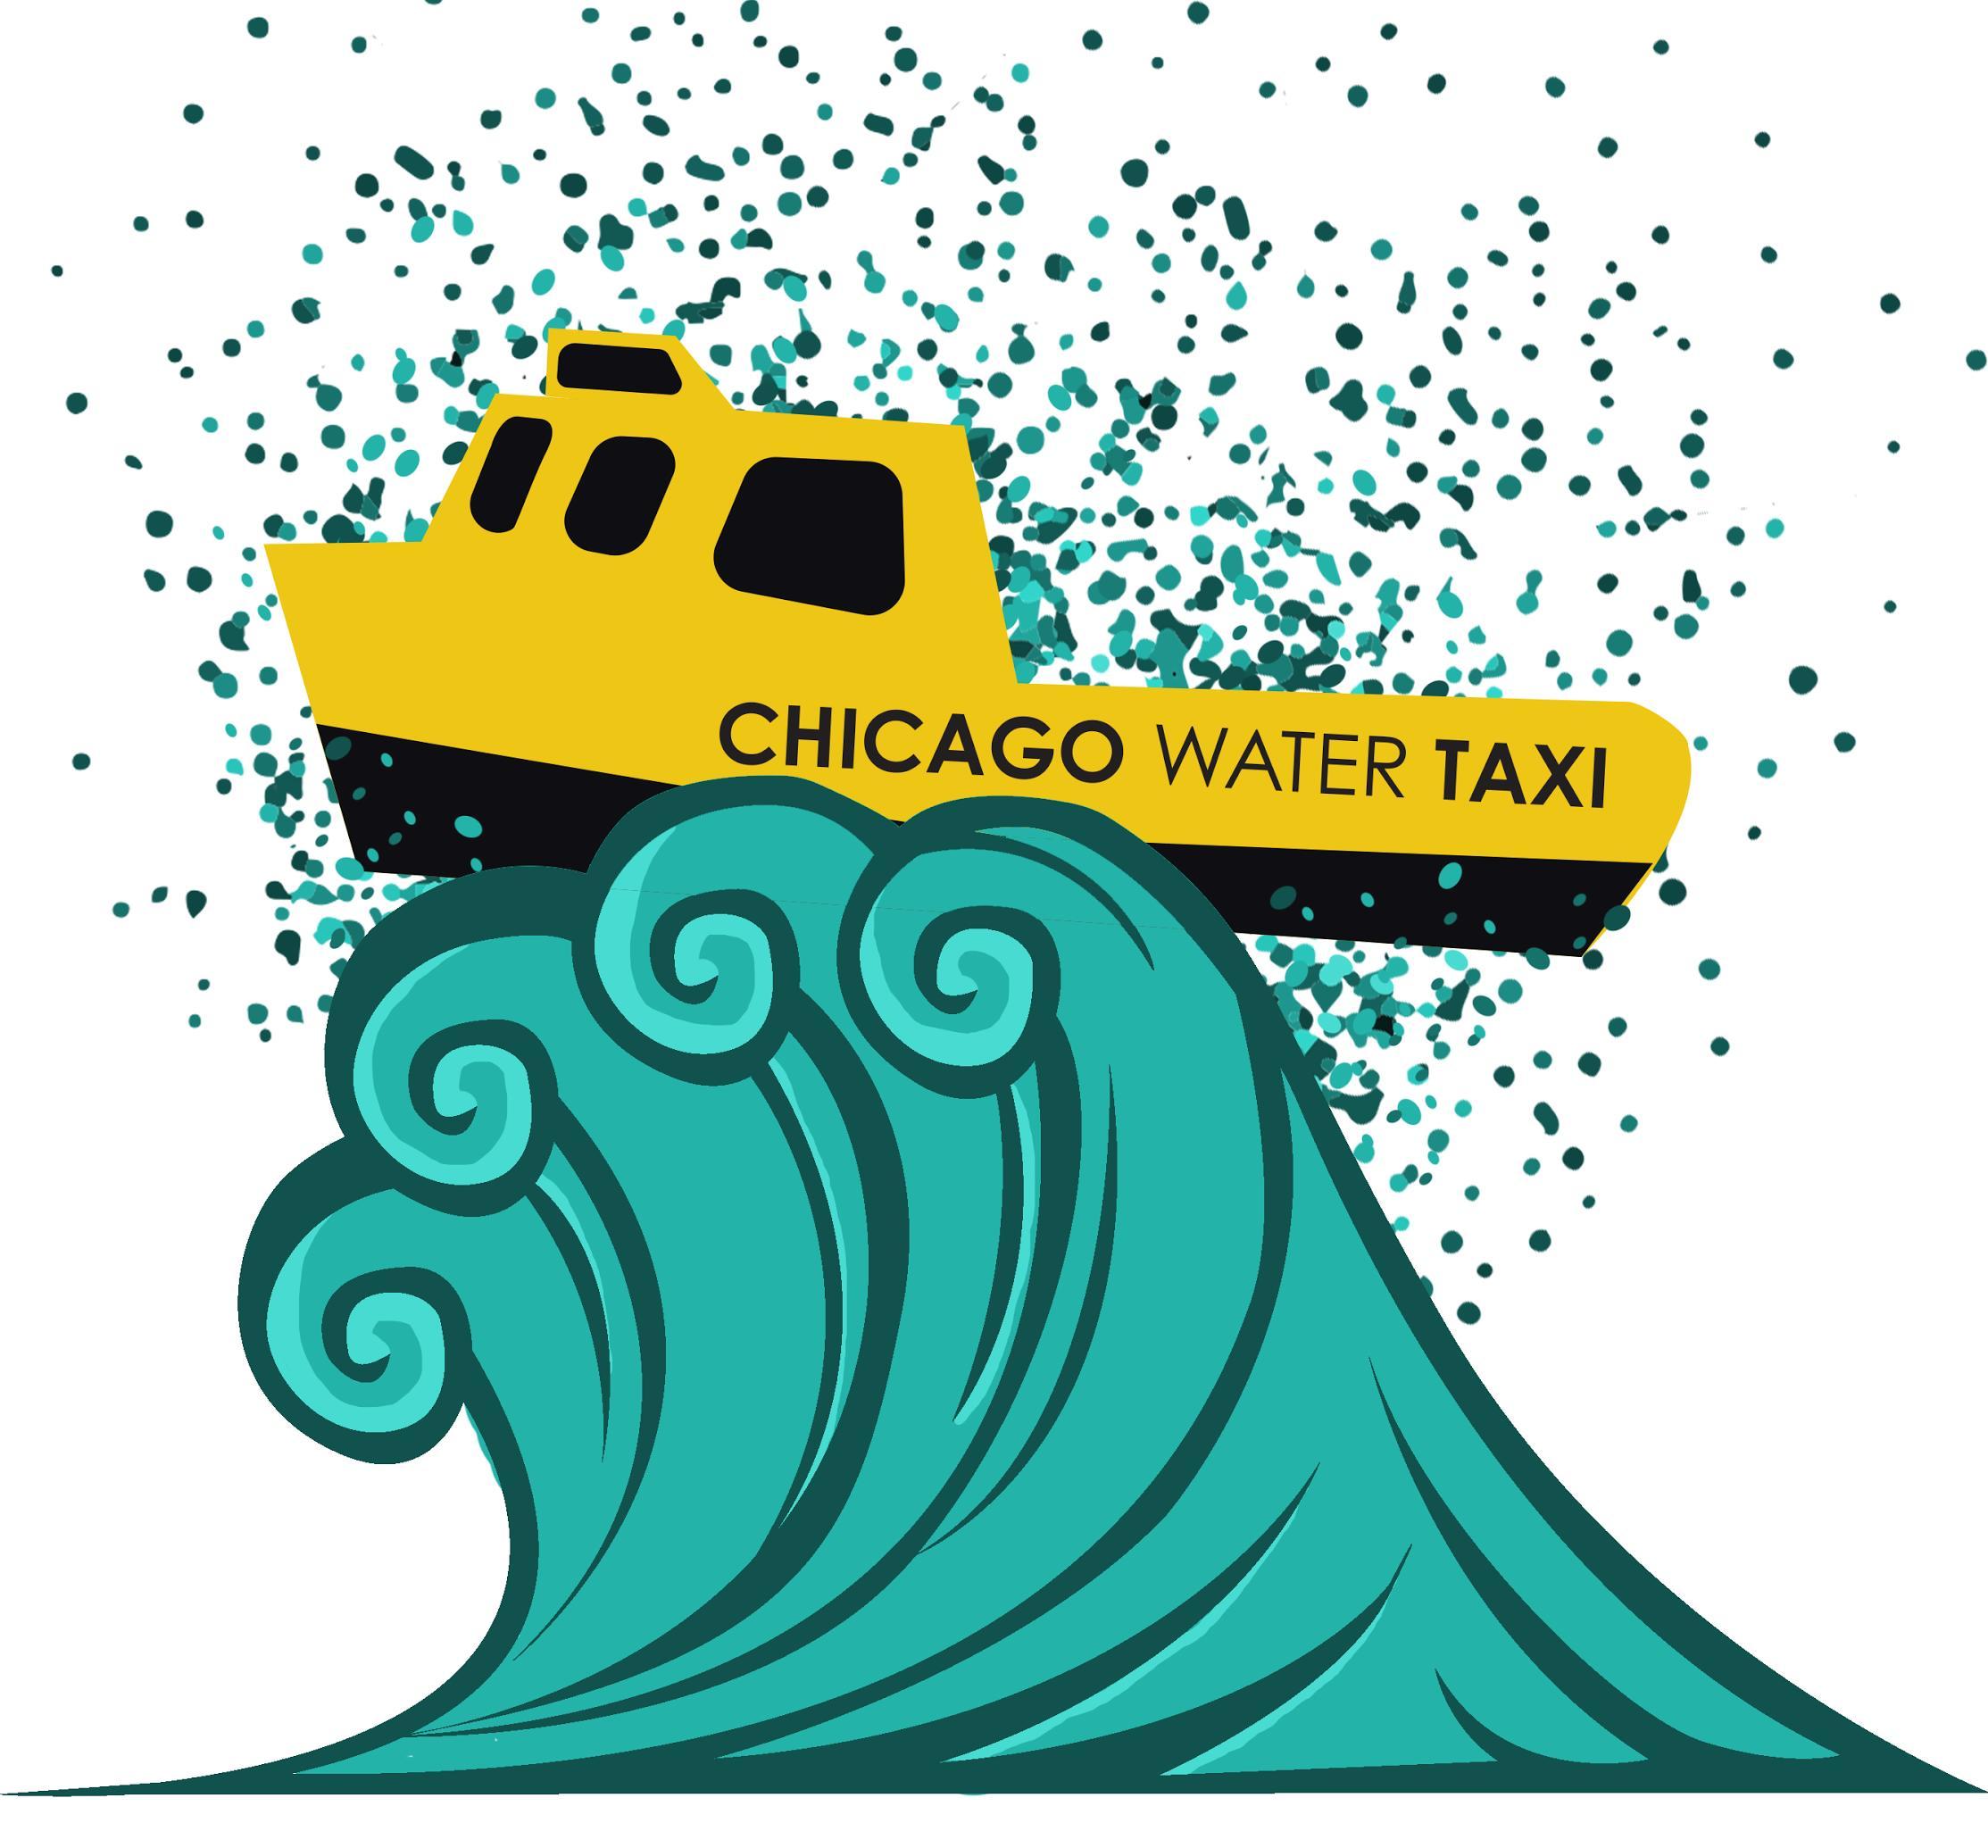 Big Yellow (Water) Taxi.